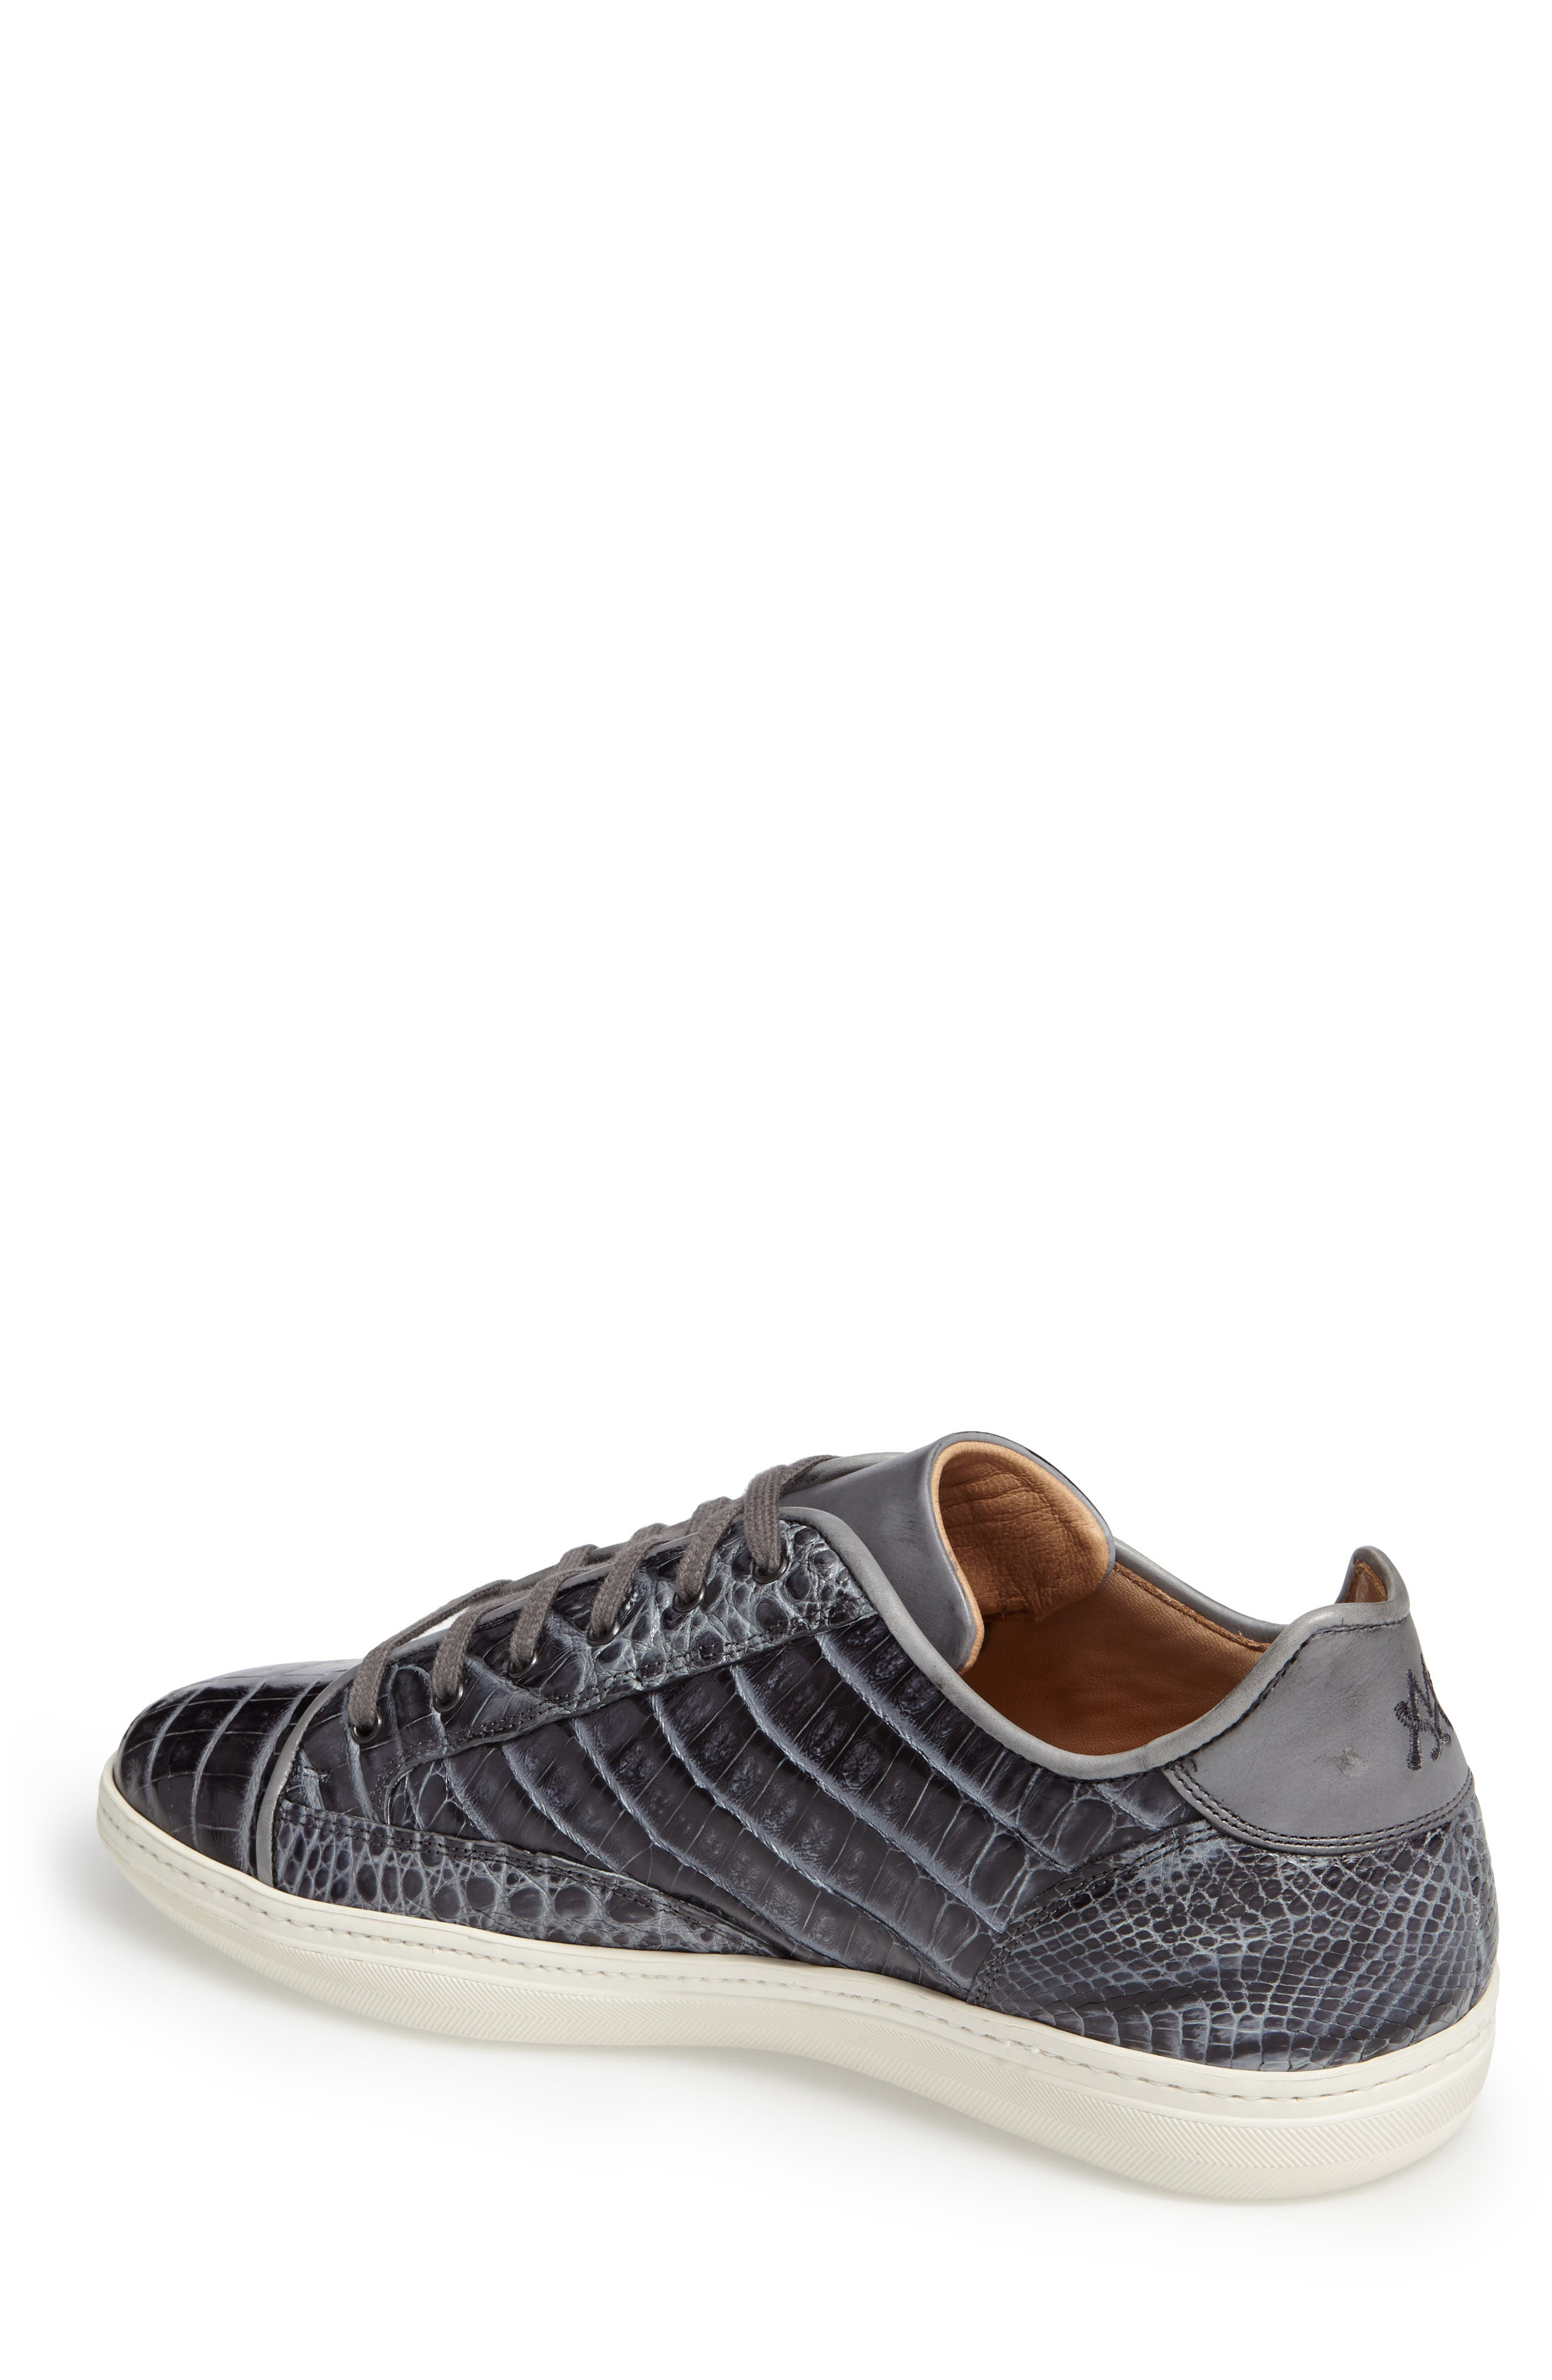 Hickman Genuine Crocodile Sneaker,                             Alternate thumbnail 2, color,                             020